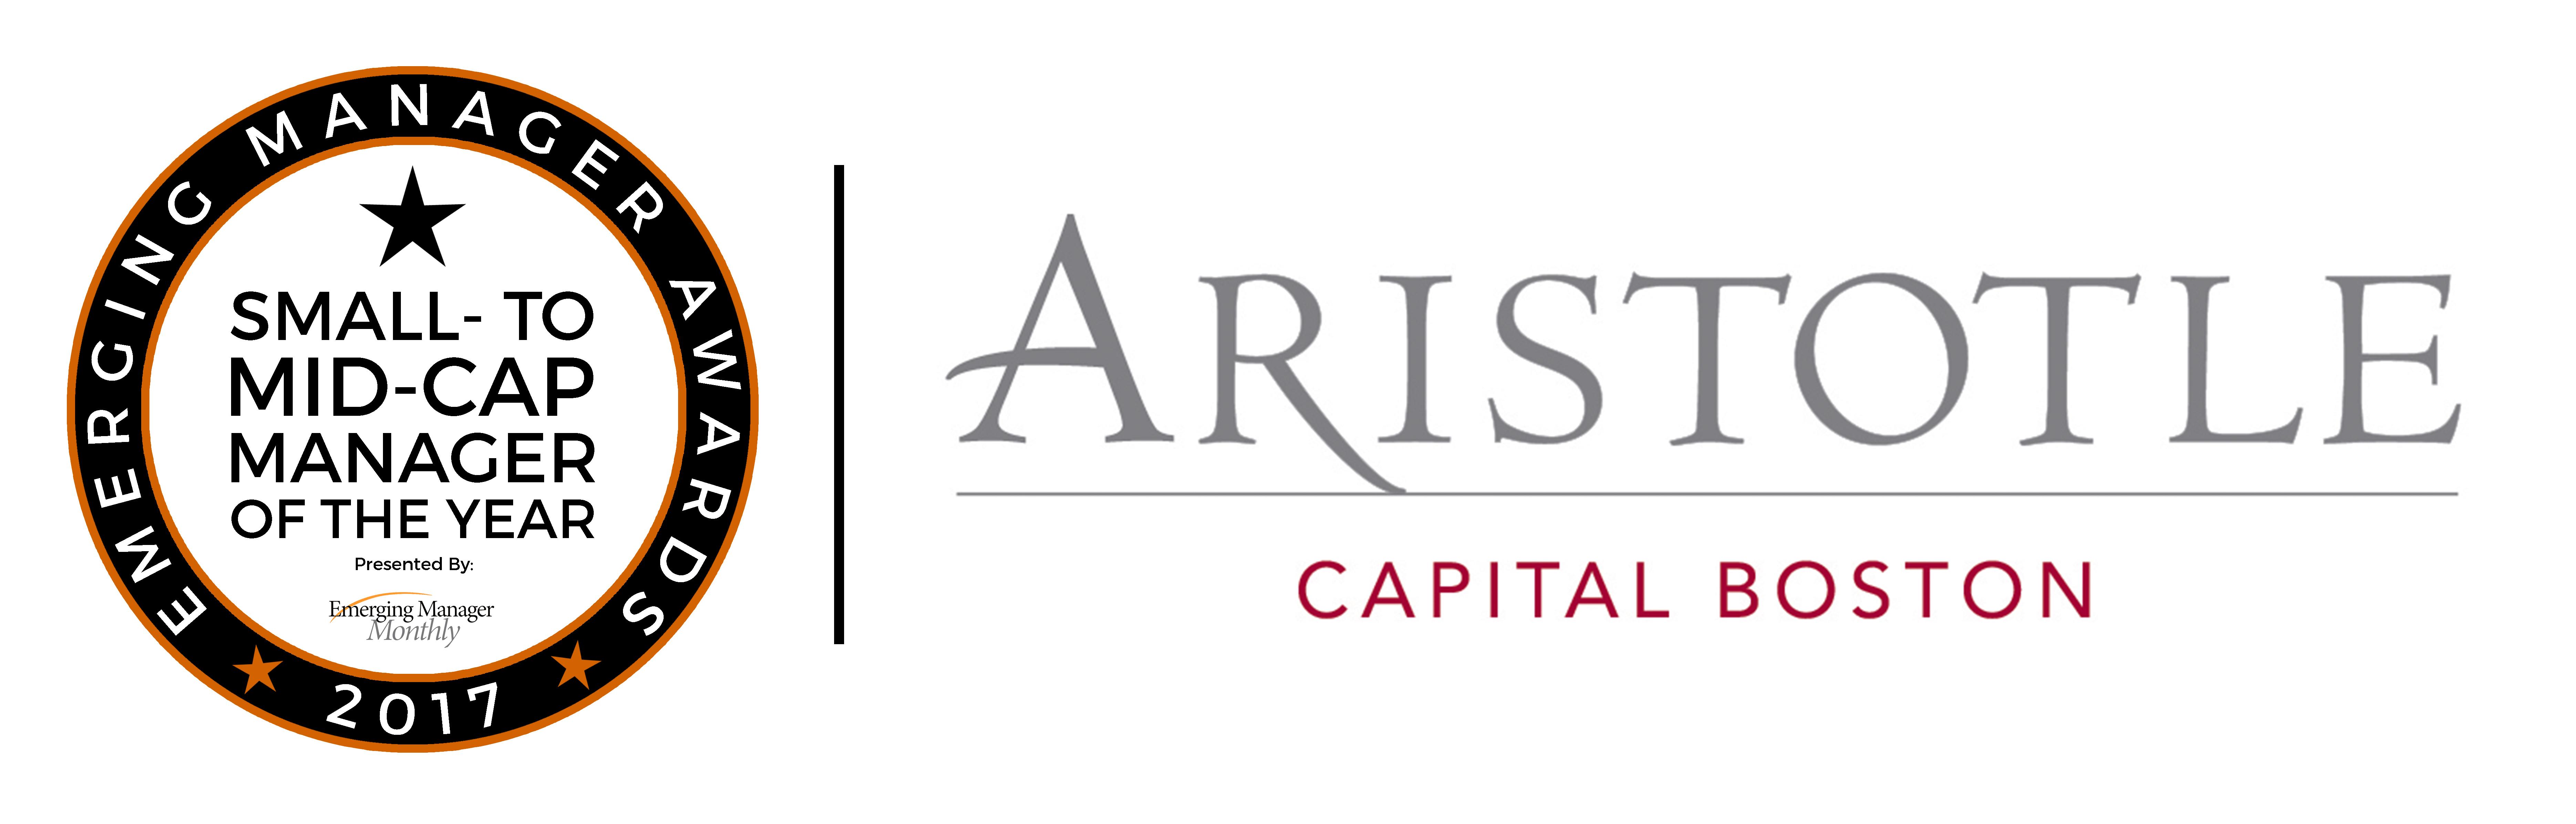 Adams capital management fund iv